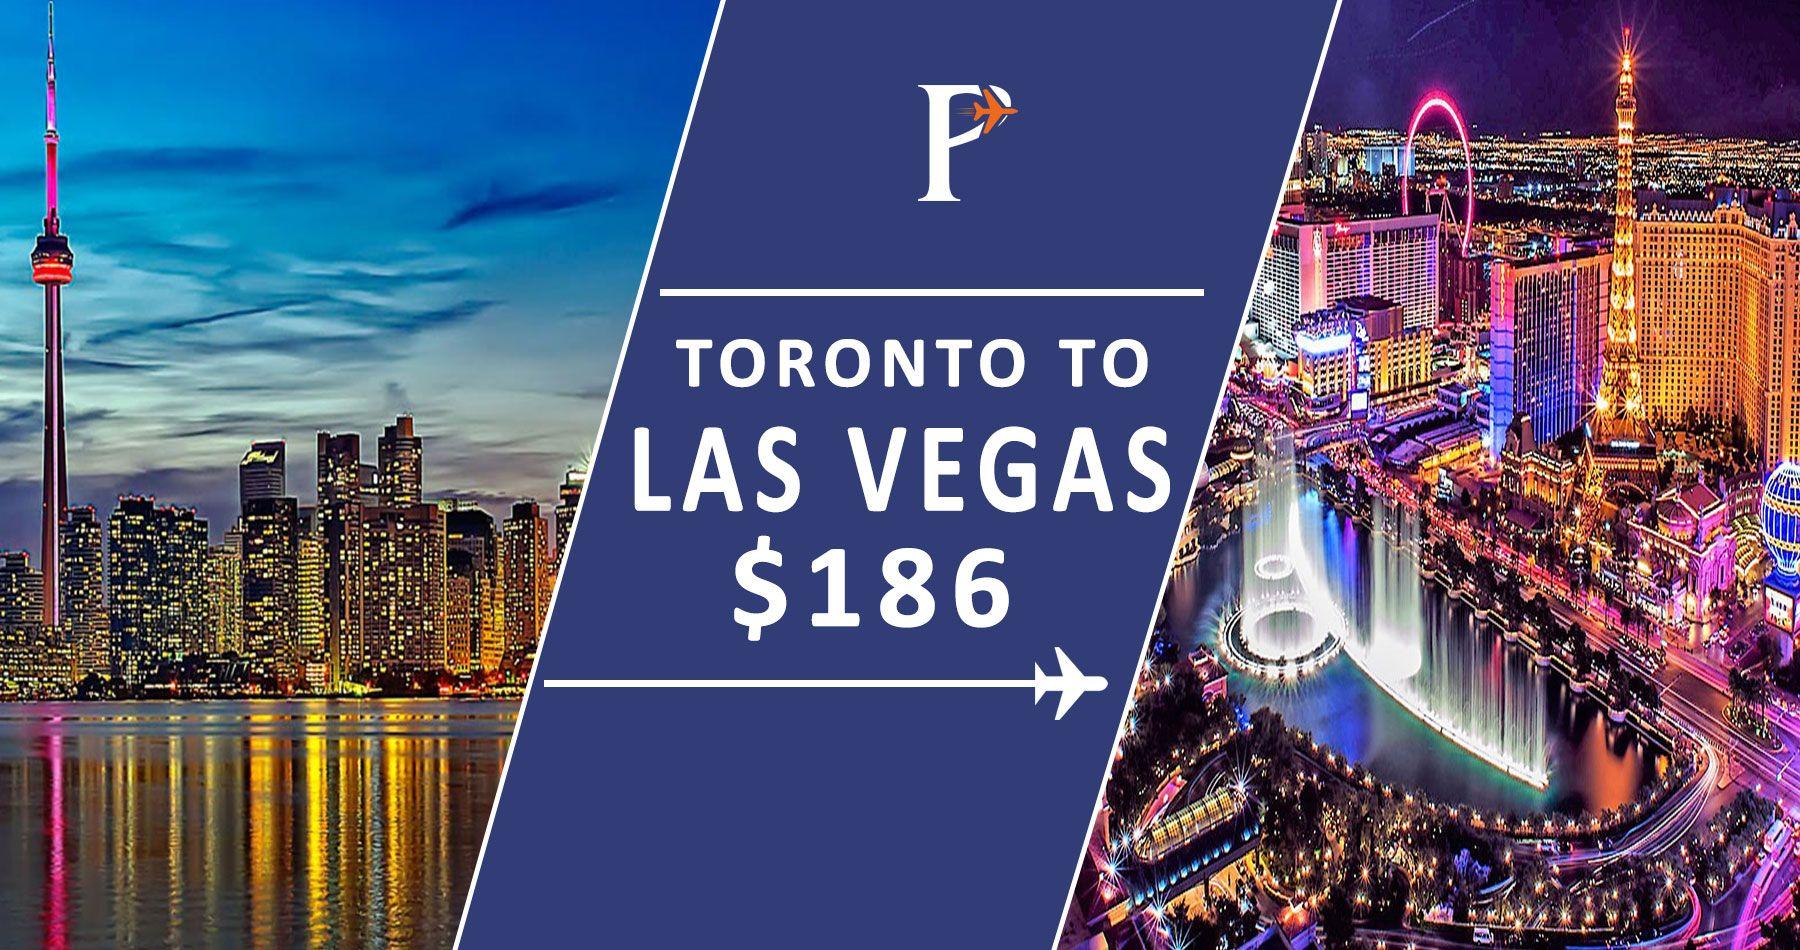 Flights to Las Vegas available LasVegas in Nevadas